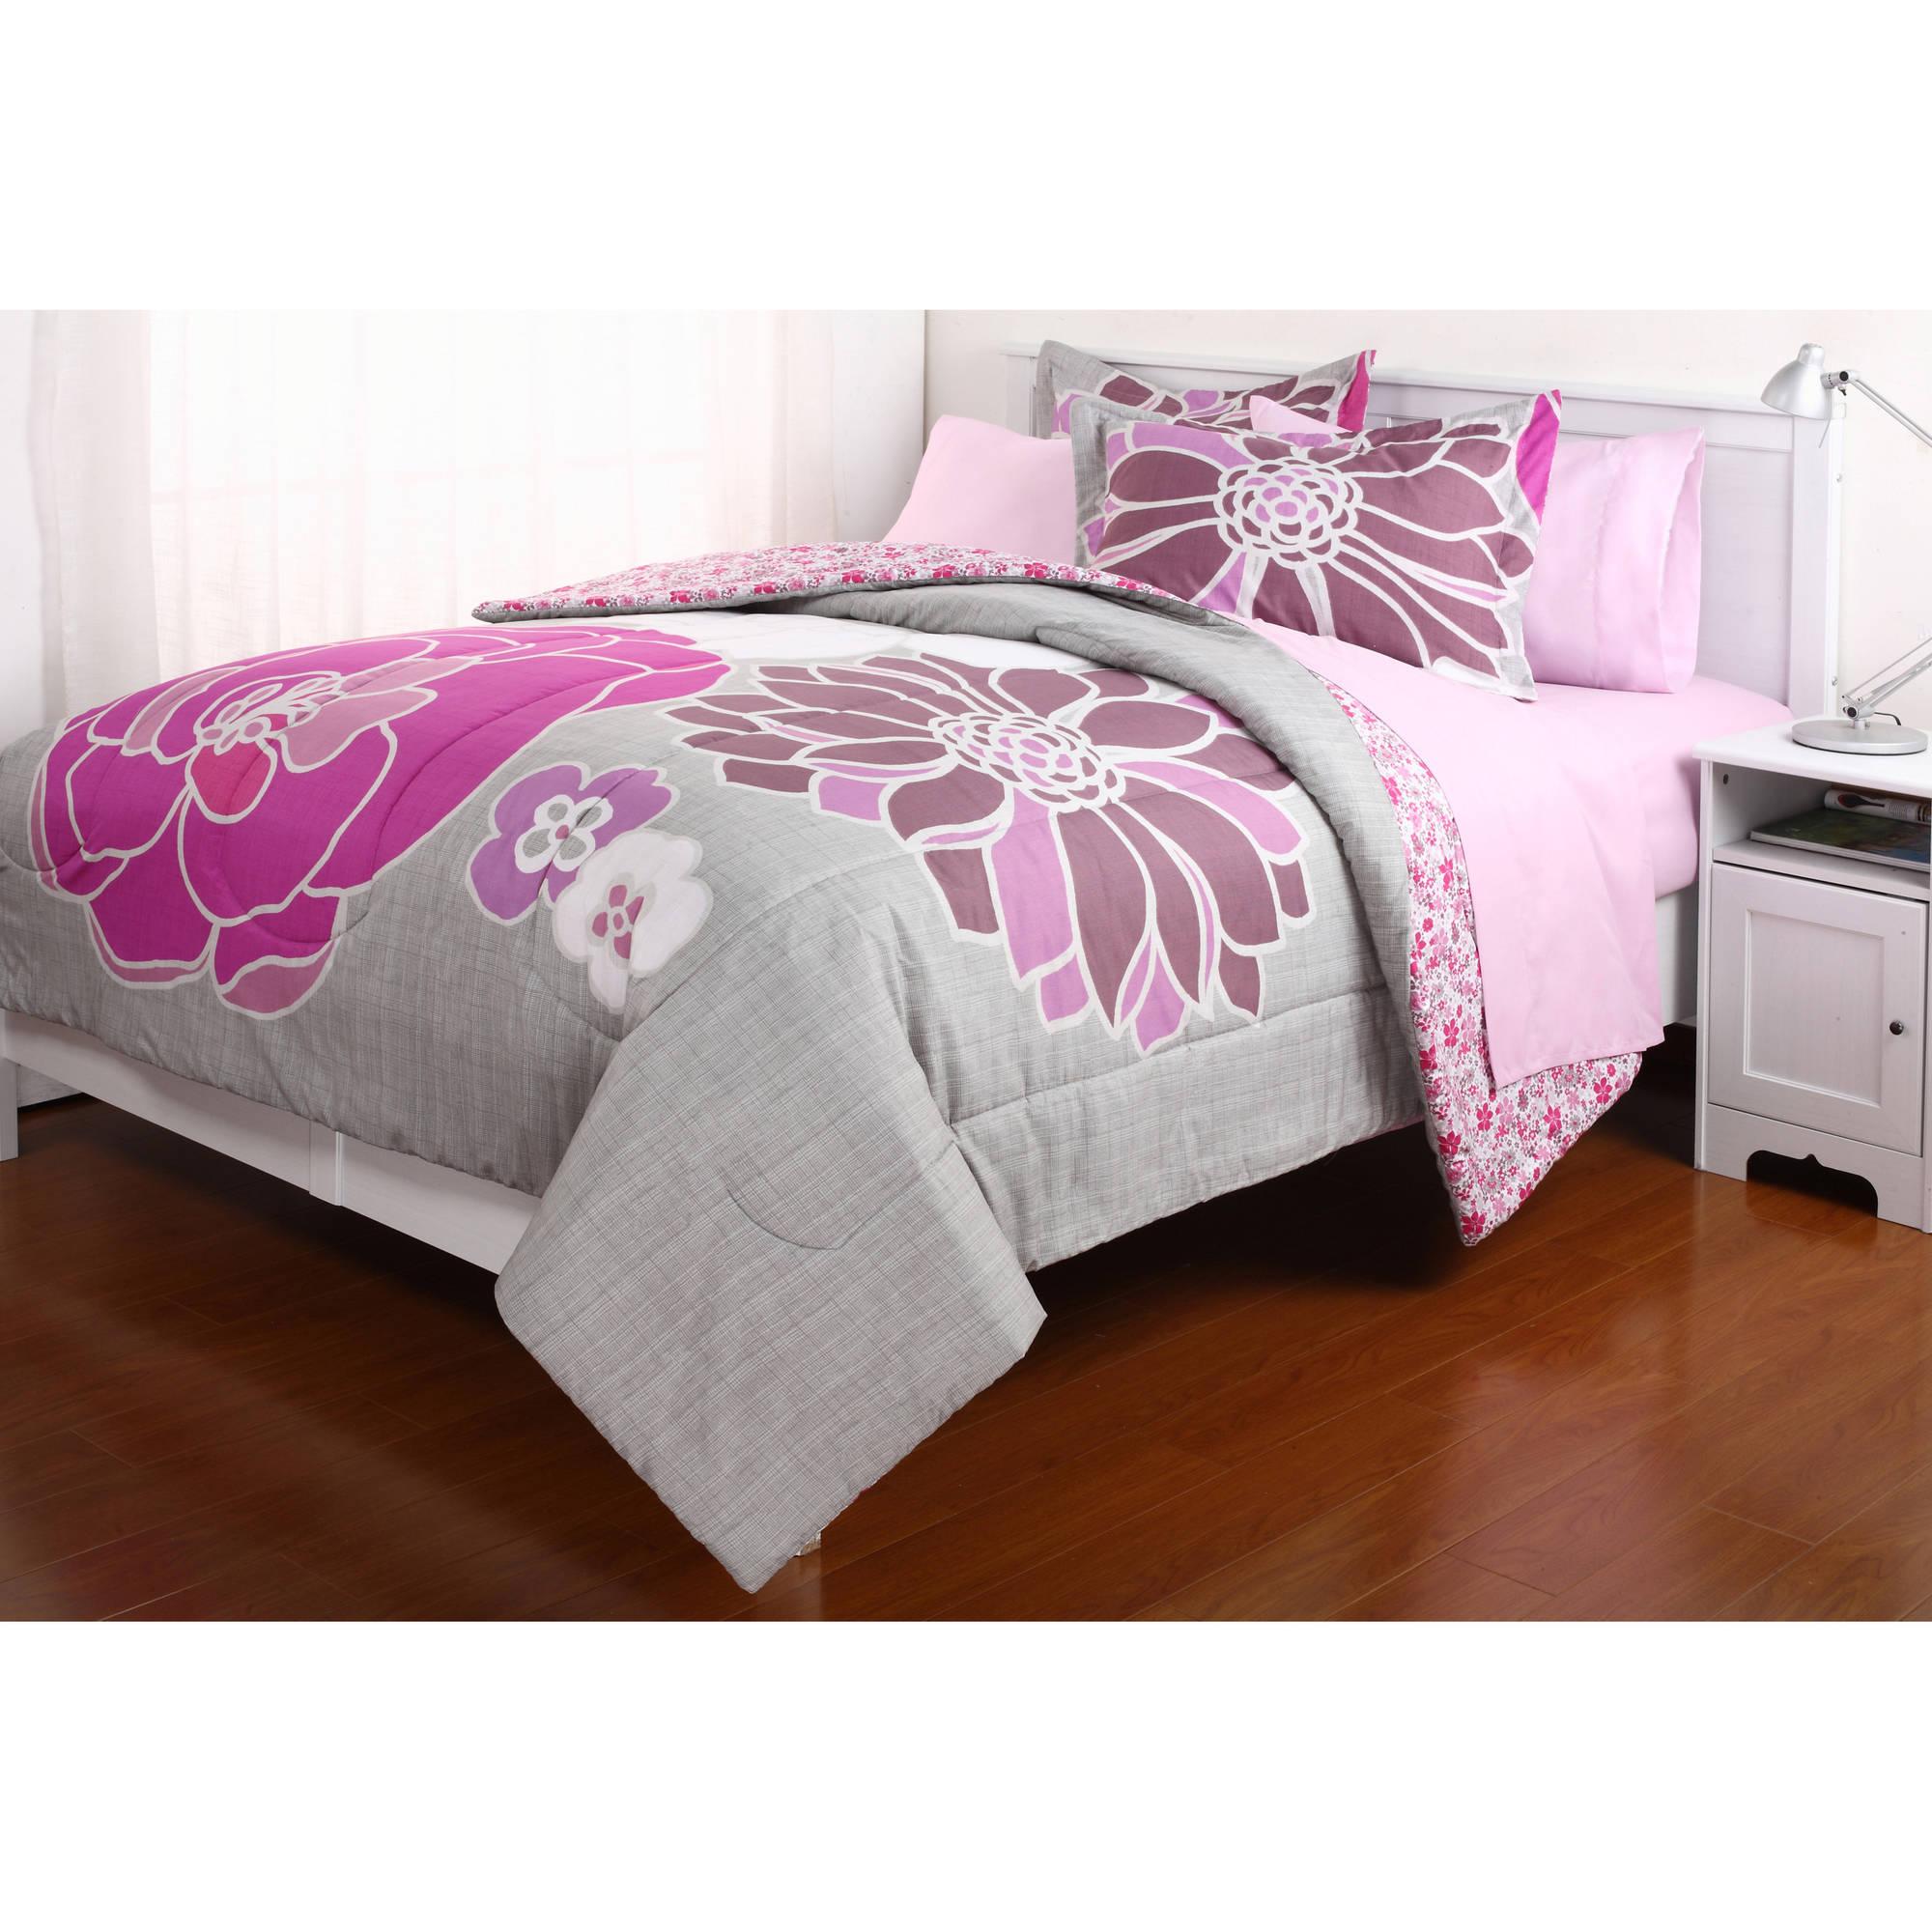 Generic Leah Reversible Bed in a Bag Bedding Set